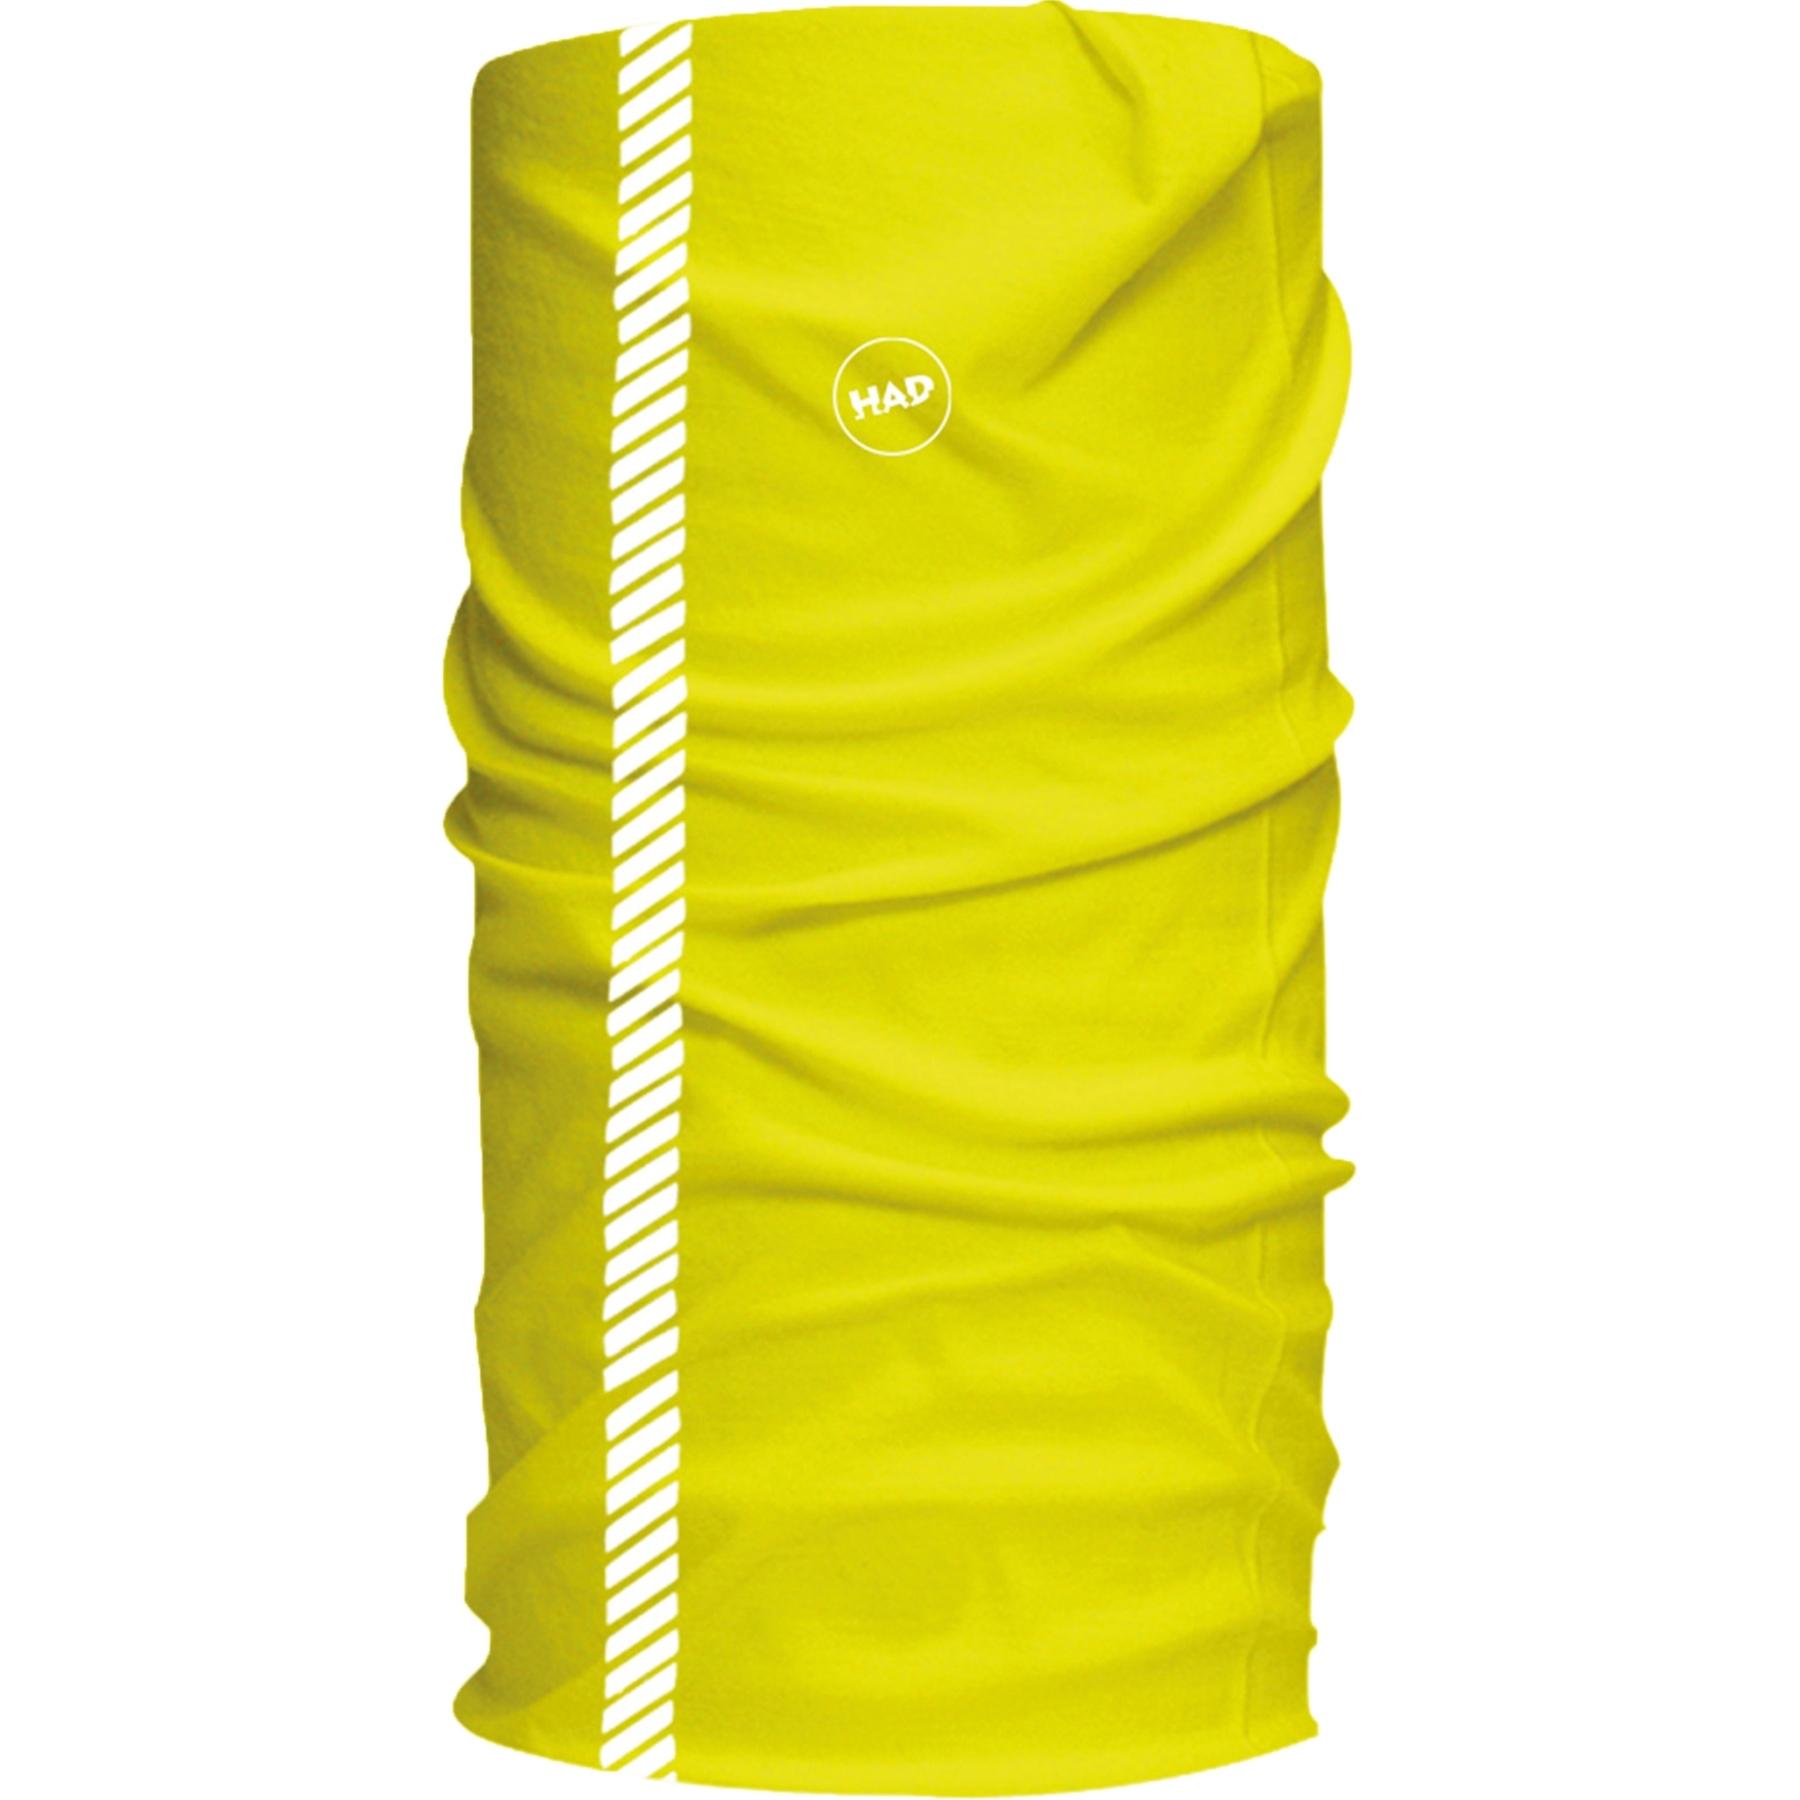 Image of HAD Reflectives Multifunctional Cloth - Fluo Yellow Reflective